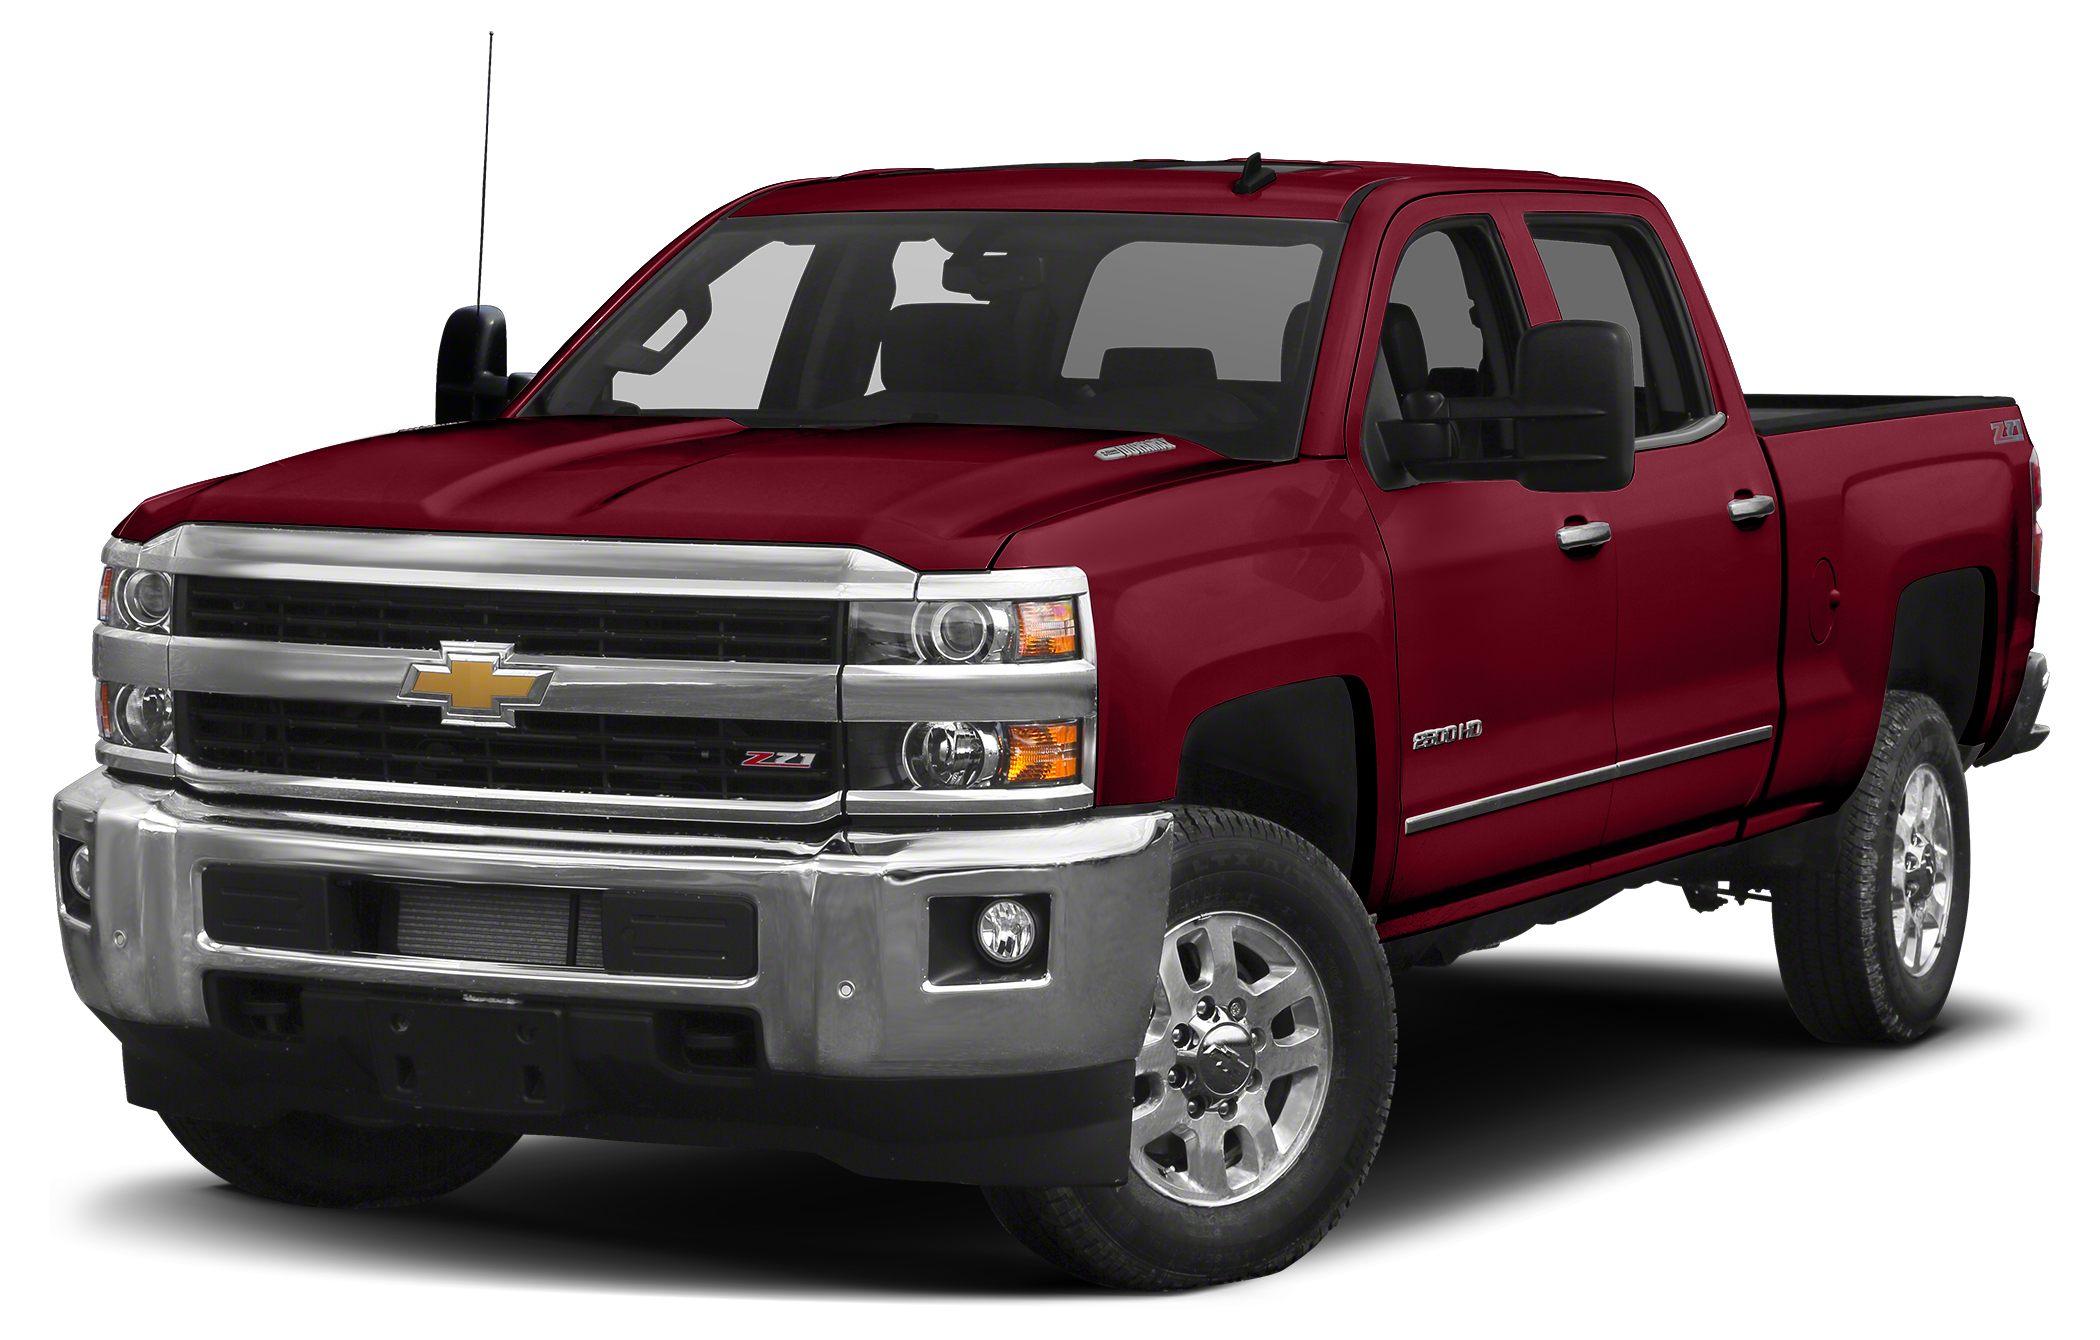 2018 Chevrolet Silverado 3500HD LTZ Miles 0Color Cajun Red Tintcoat Stock 185790 VIN 1GC4K0E